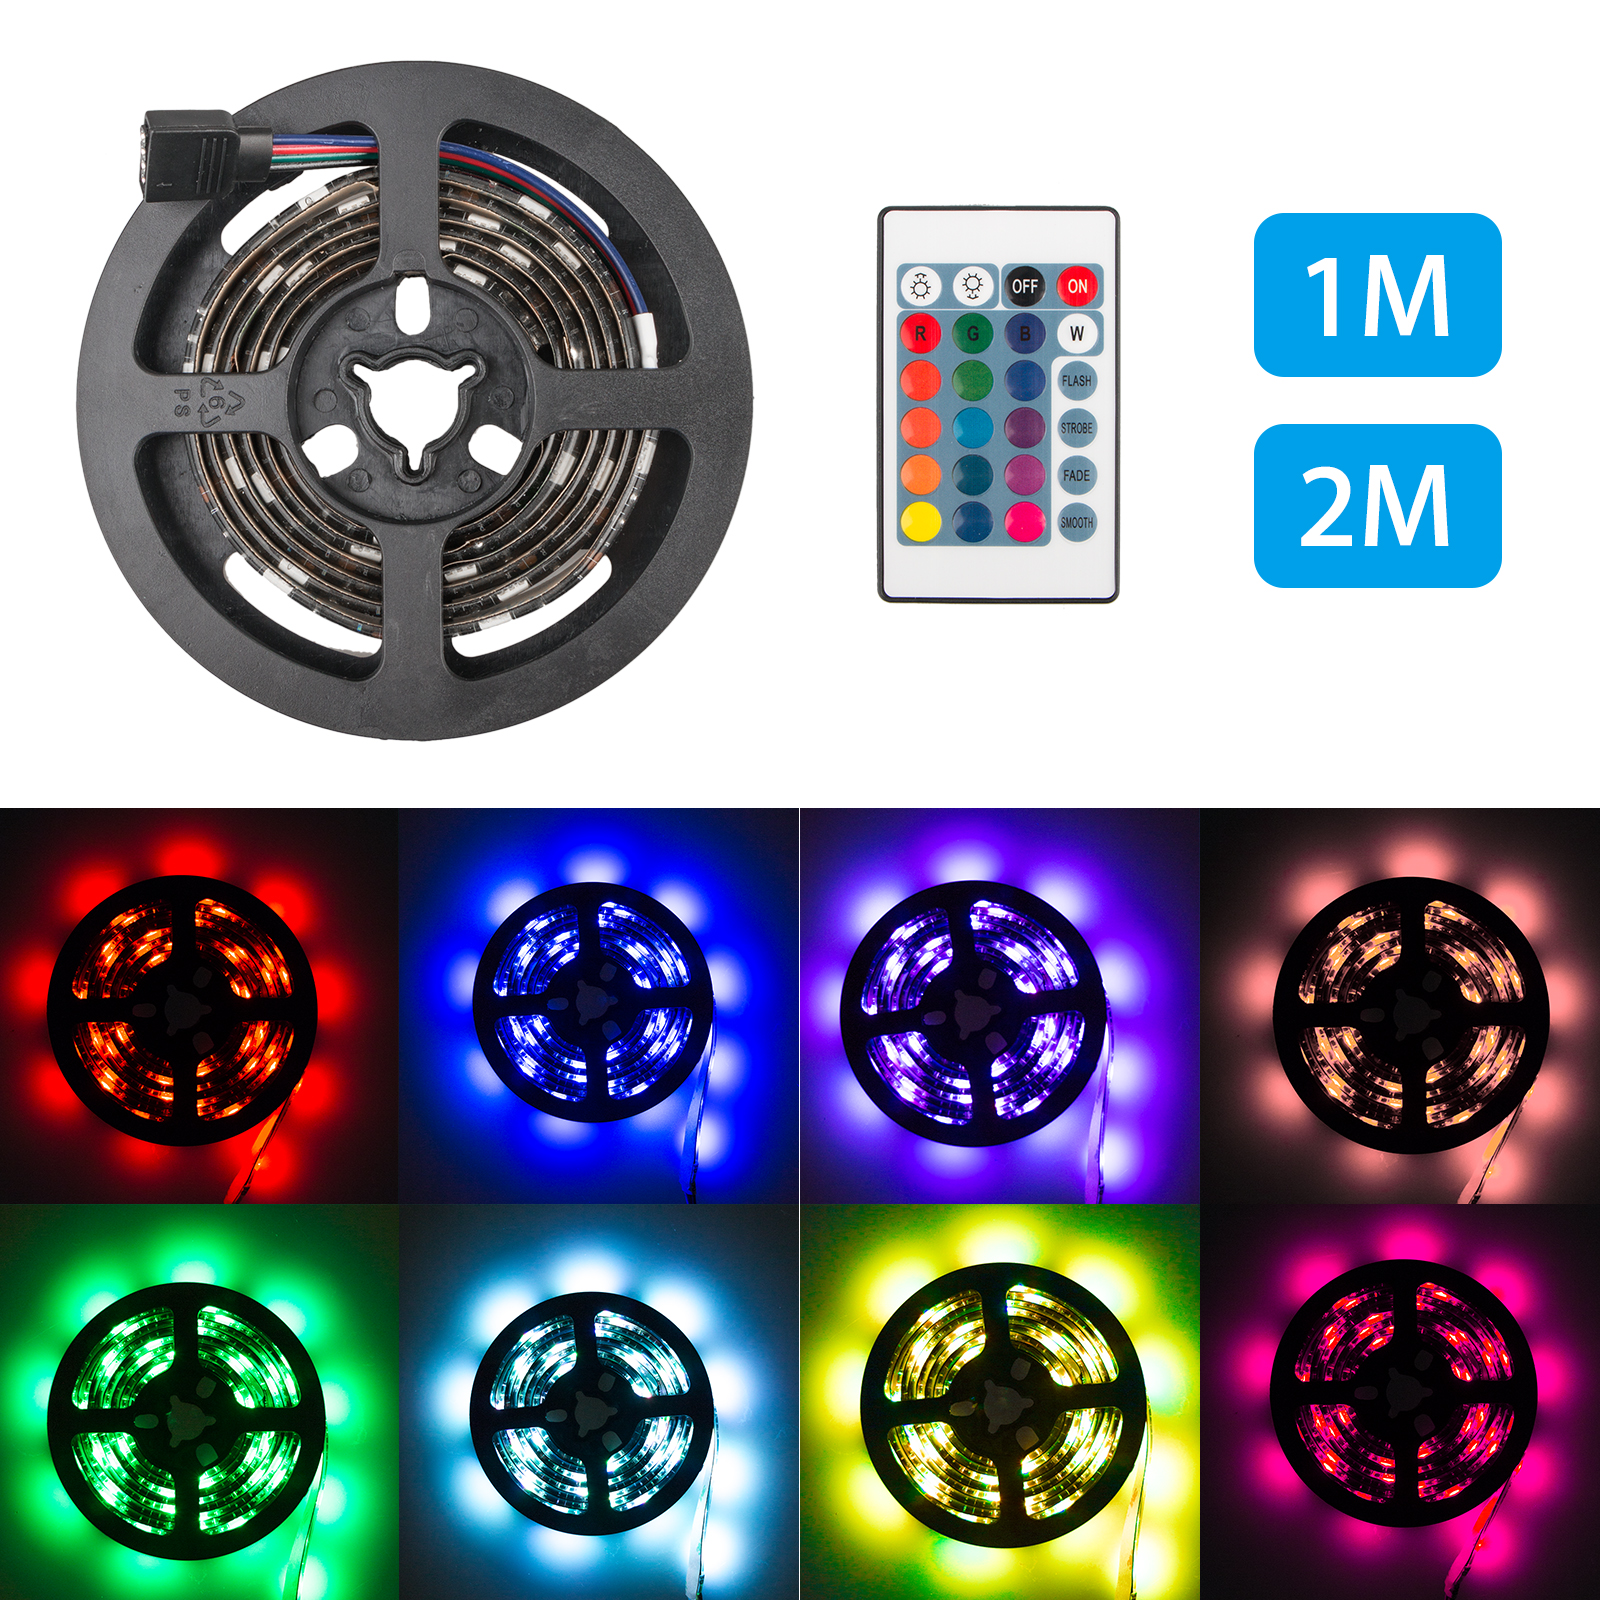 LED Strip Waterproof 18 LED Battery-powered Adhesive Tape Light TV Bike Outdoor